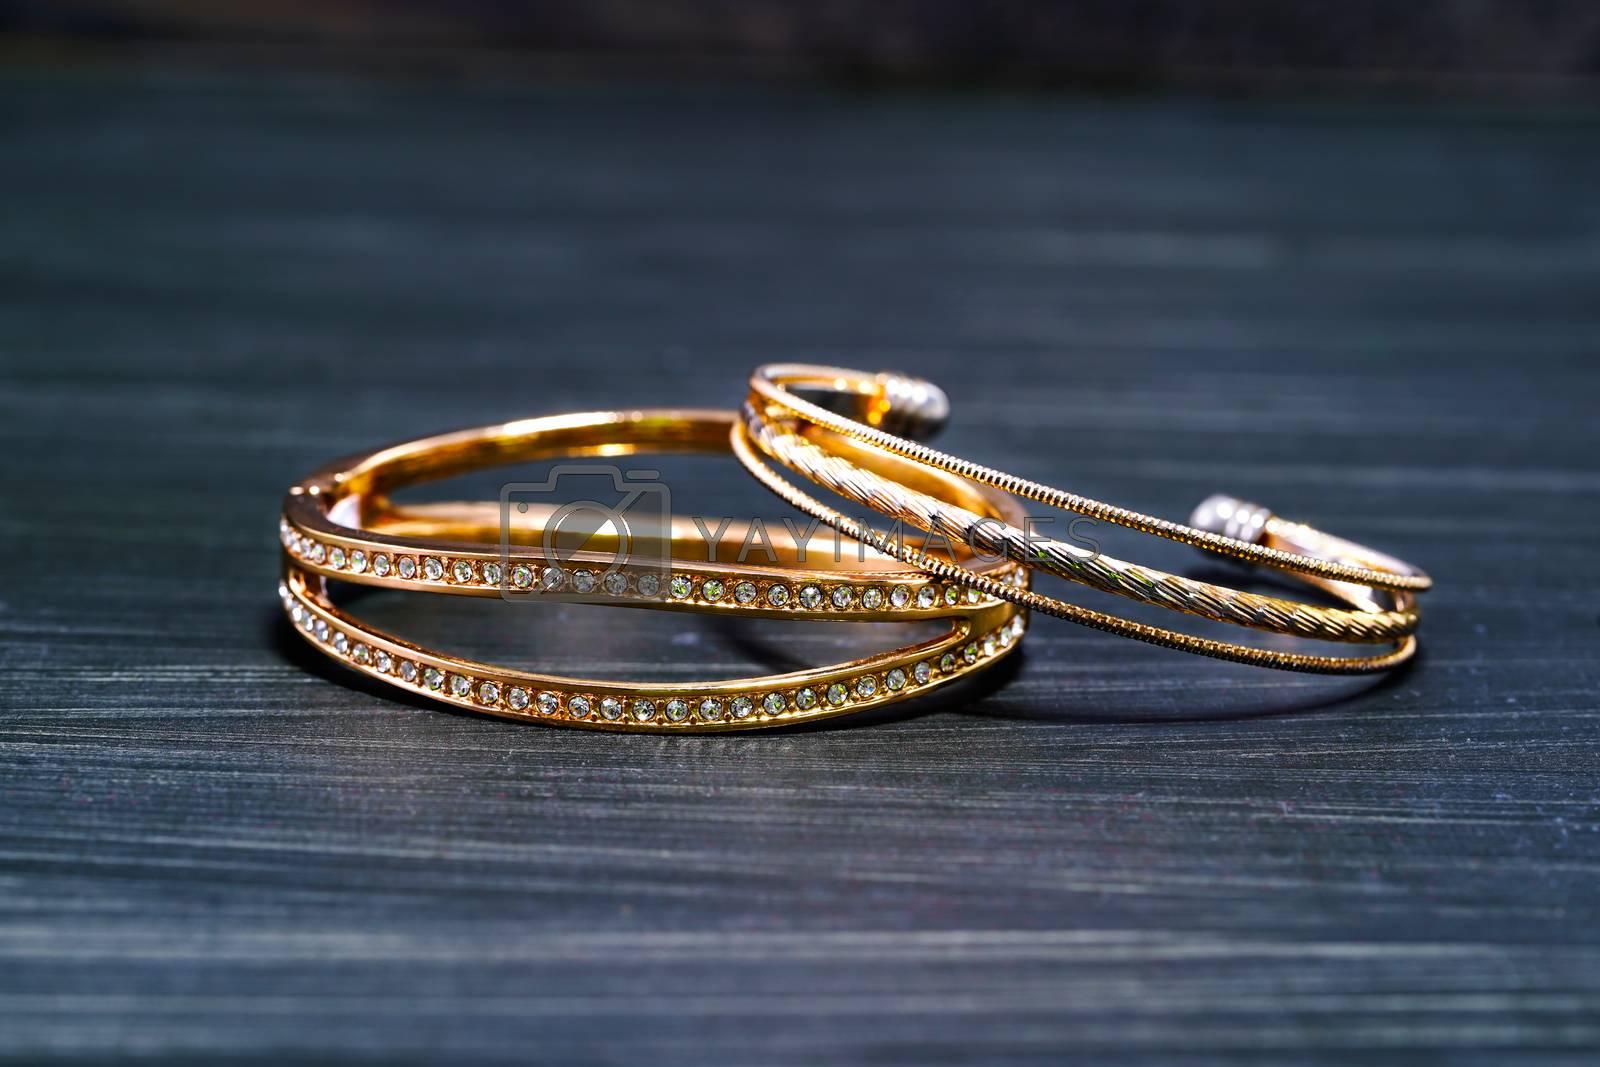 Closeup Gold ring diamond gem. Gold wedding rings with diamond